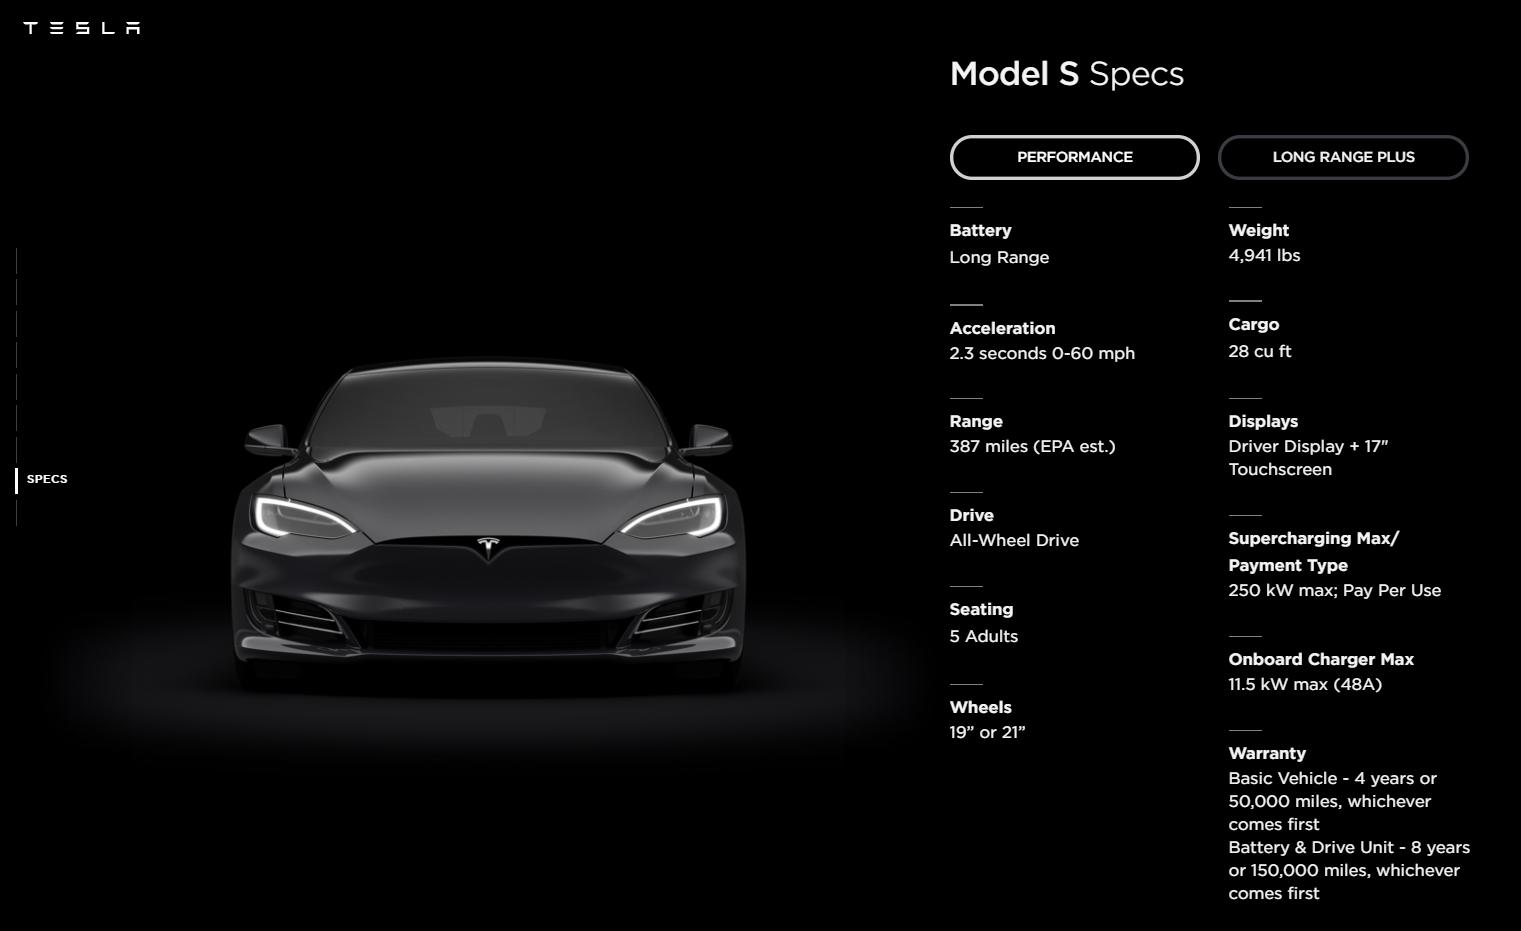 Tesla Model S Image 4